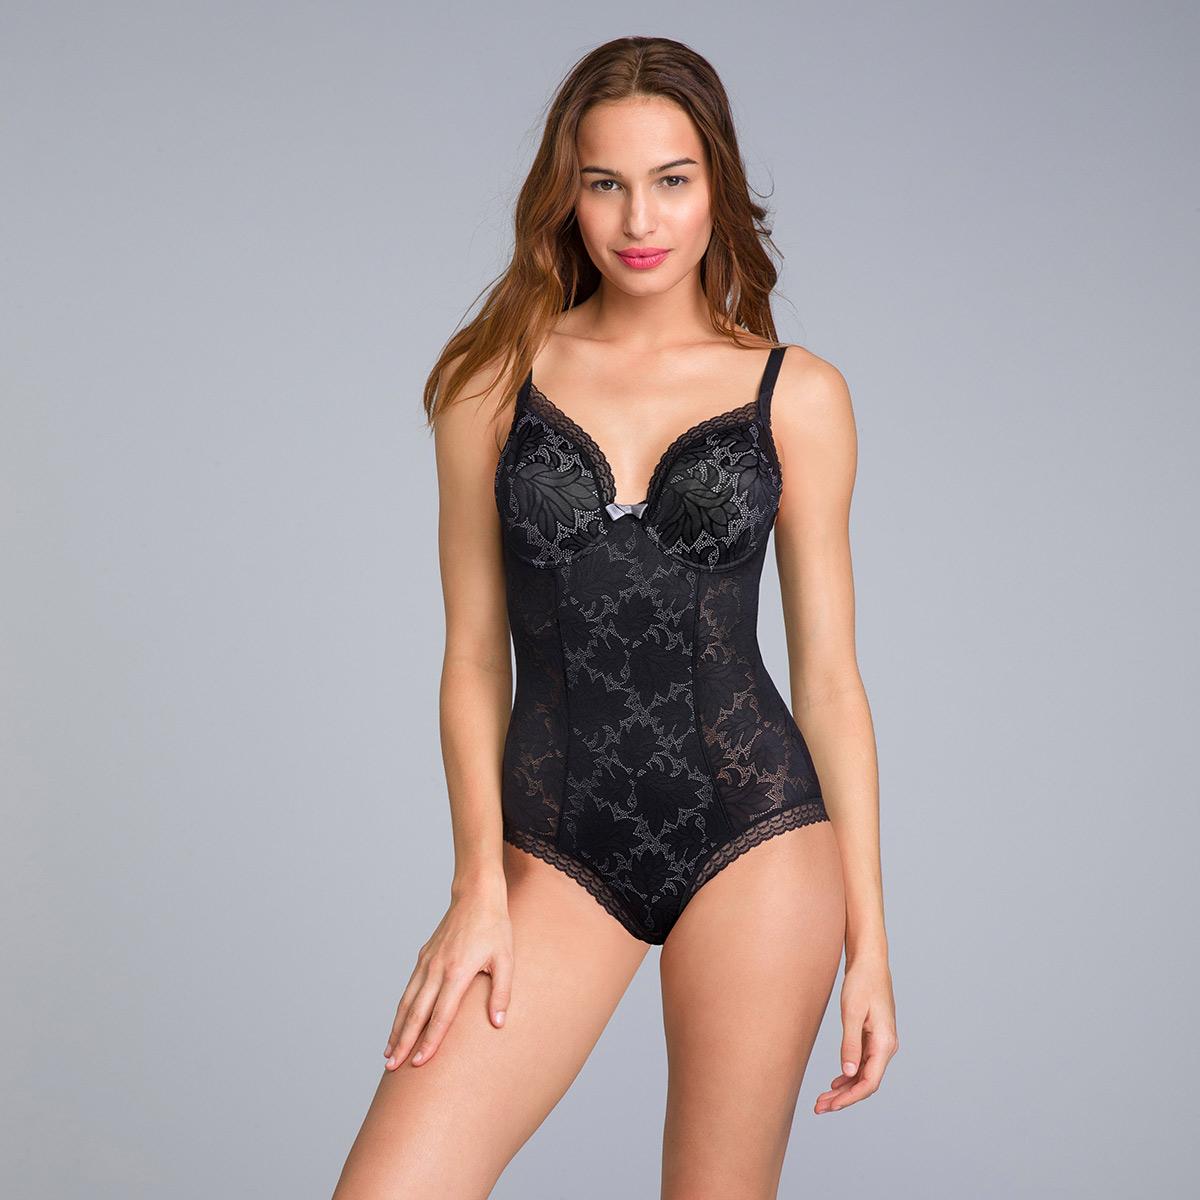 Body dentelle noir - Invisible Elegance, , PLAYTEX